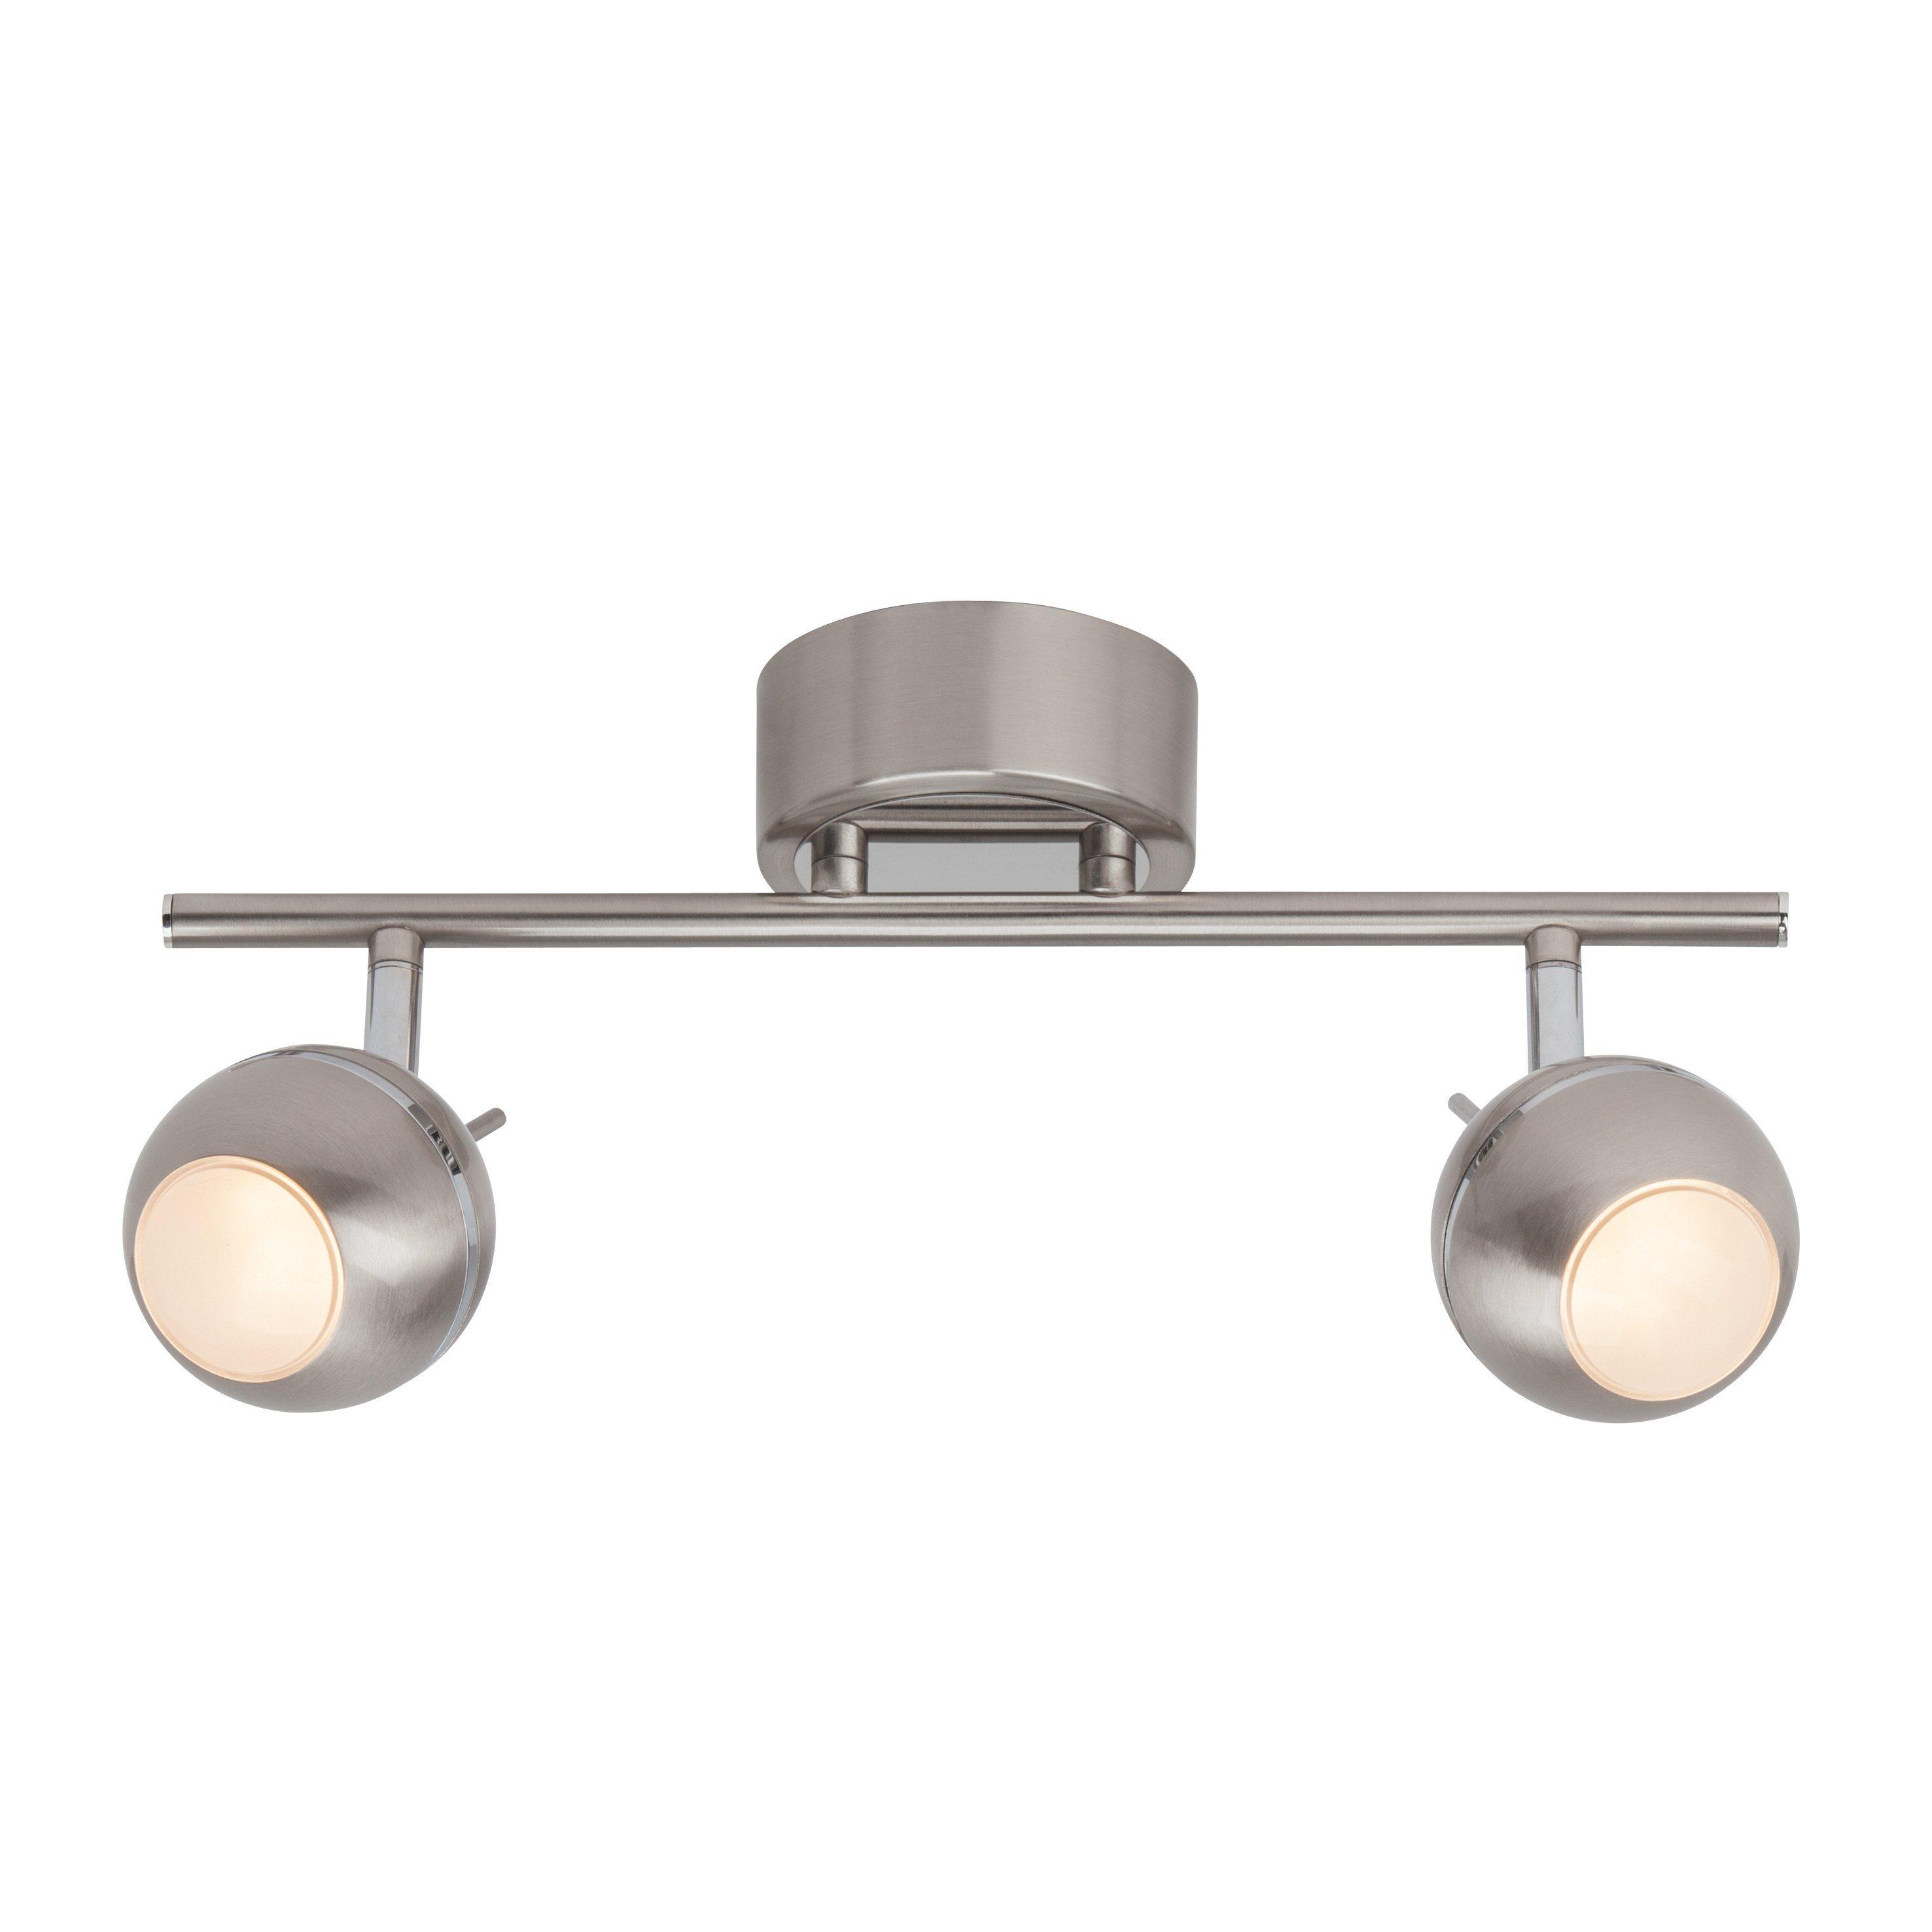 Brilliant Leuchten Comb LED Spotrohr, 2-flammig eisen/chrom